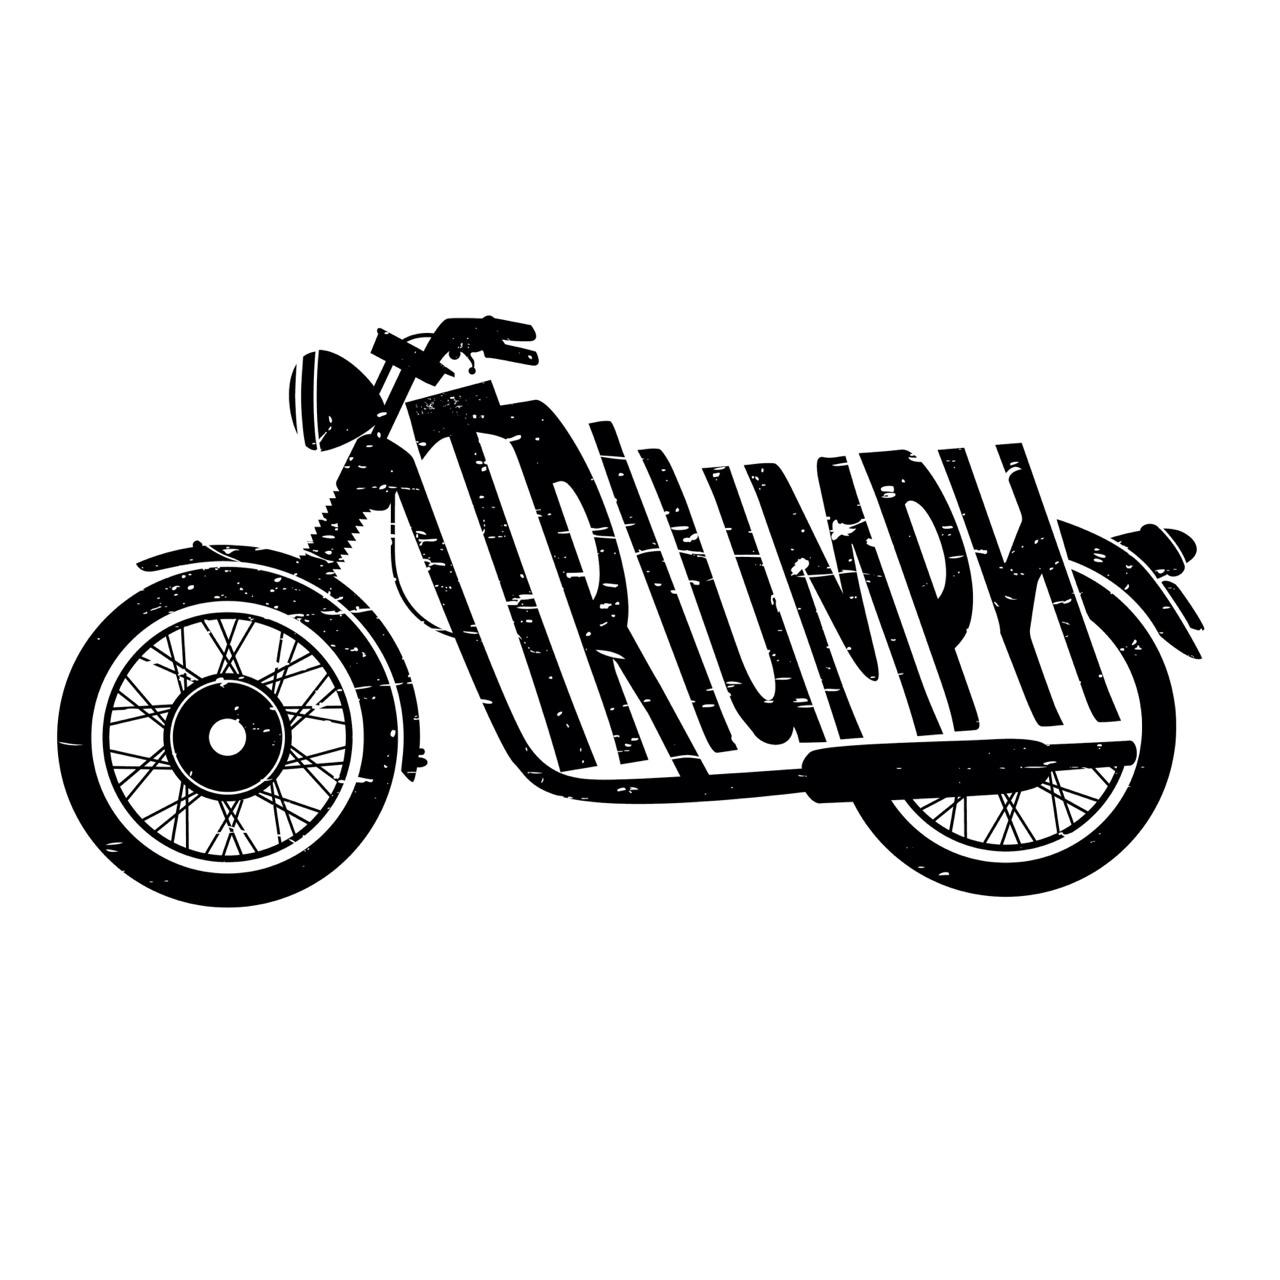 Triumph Motorcycles Logo Vector Widescreen 2 HD Wallpapers ...